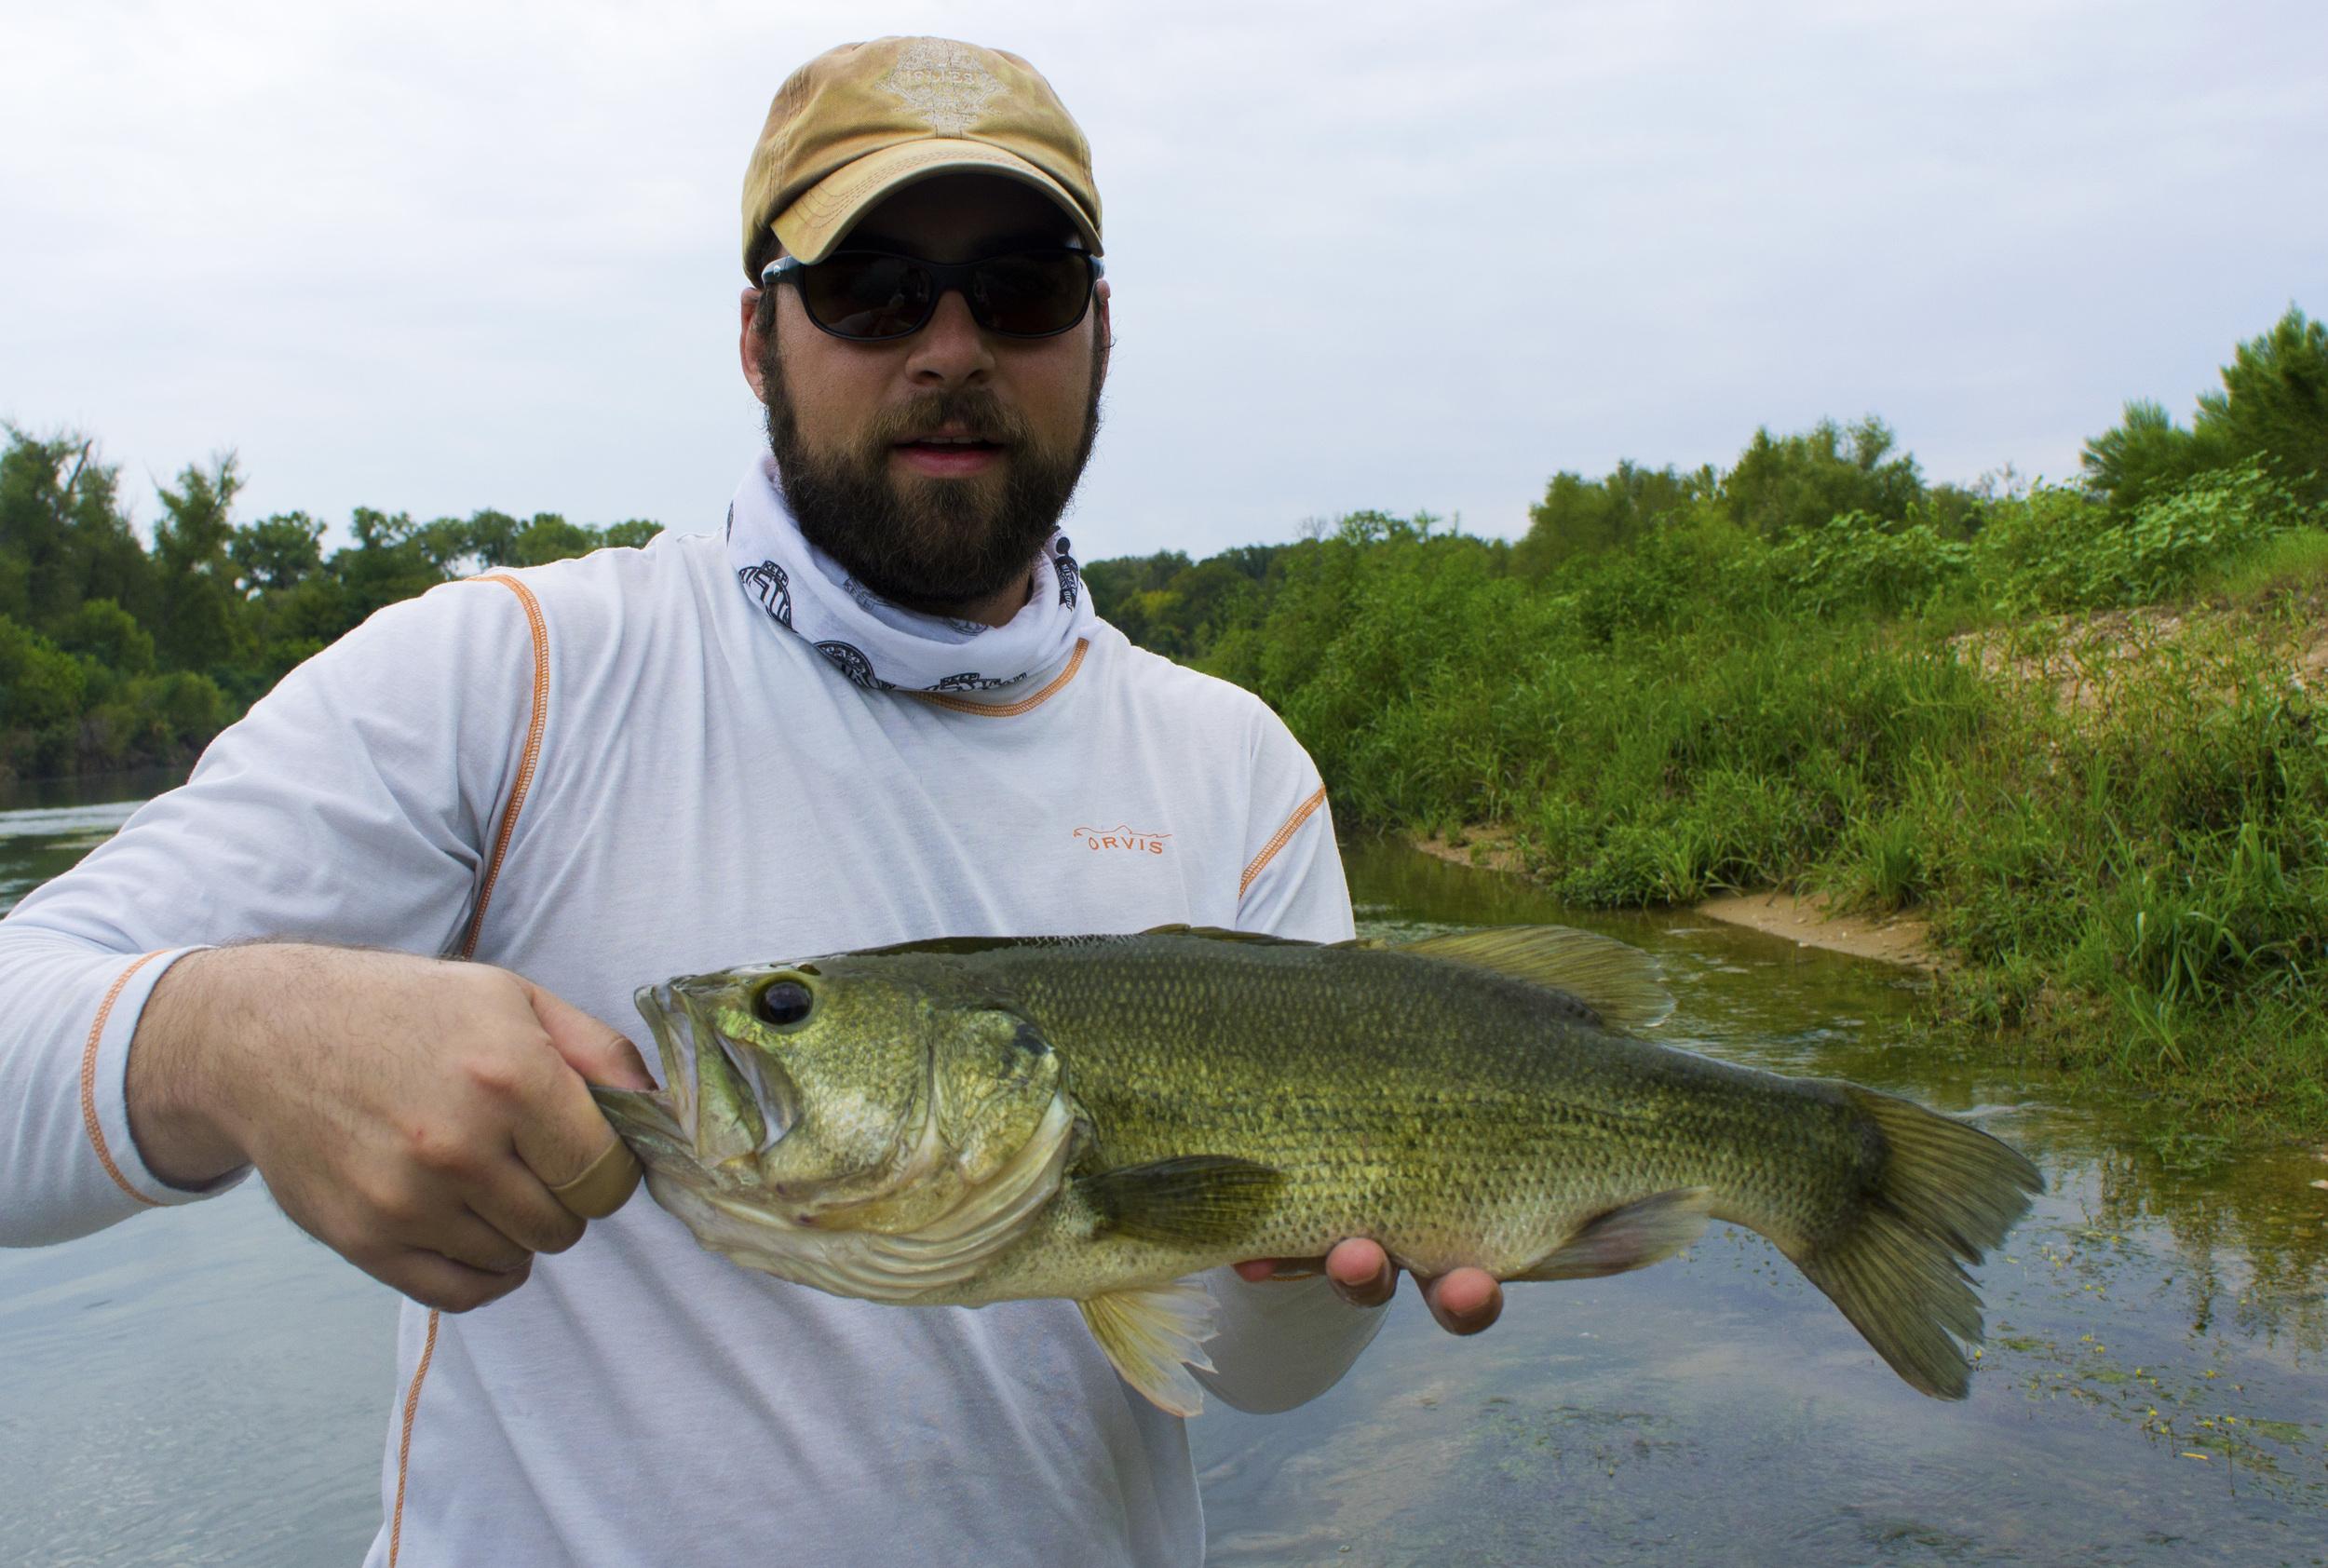 Jeff with a nice Colorado River bass